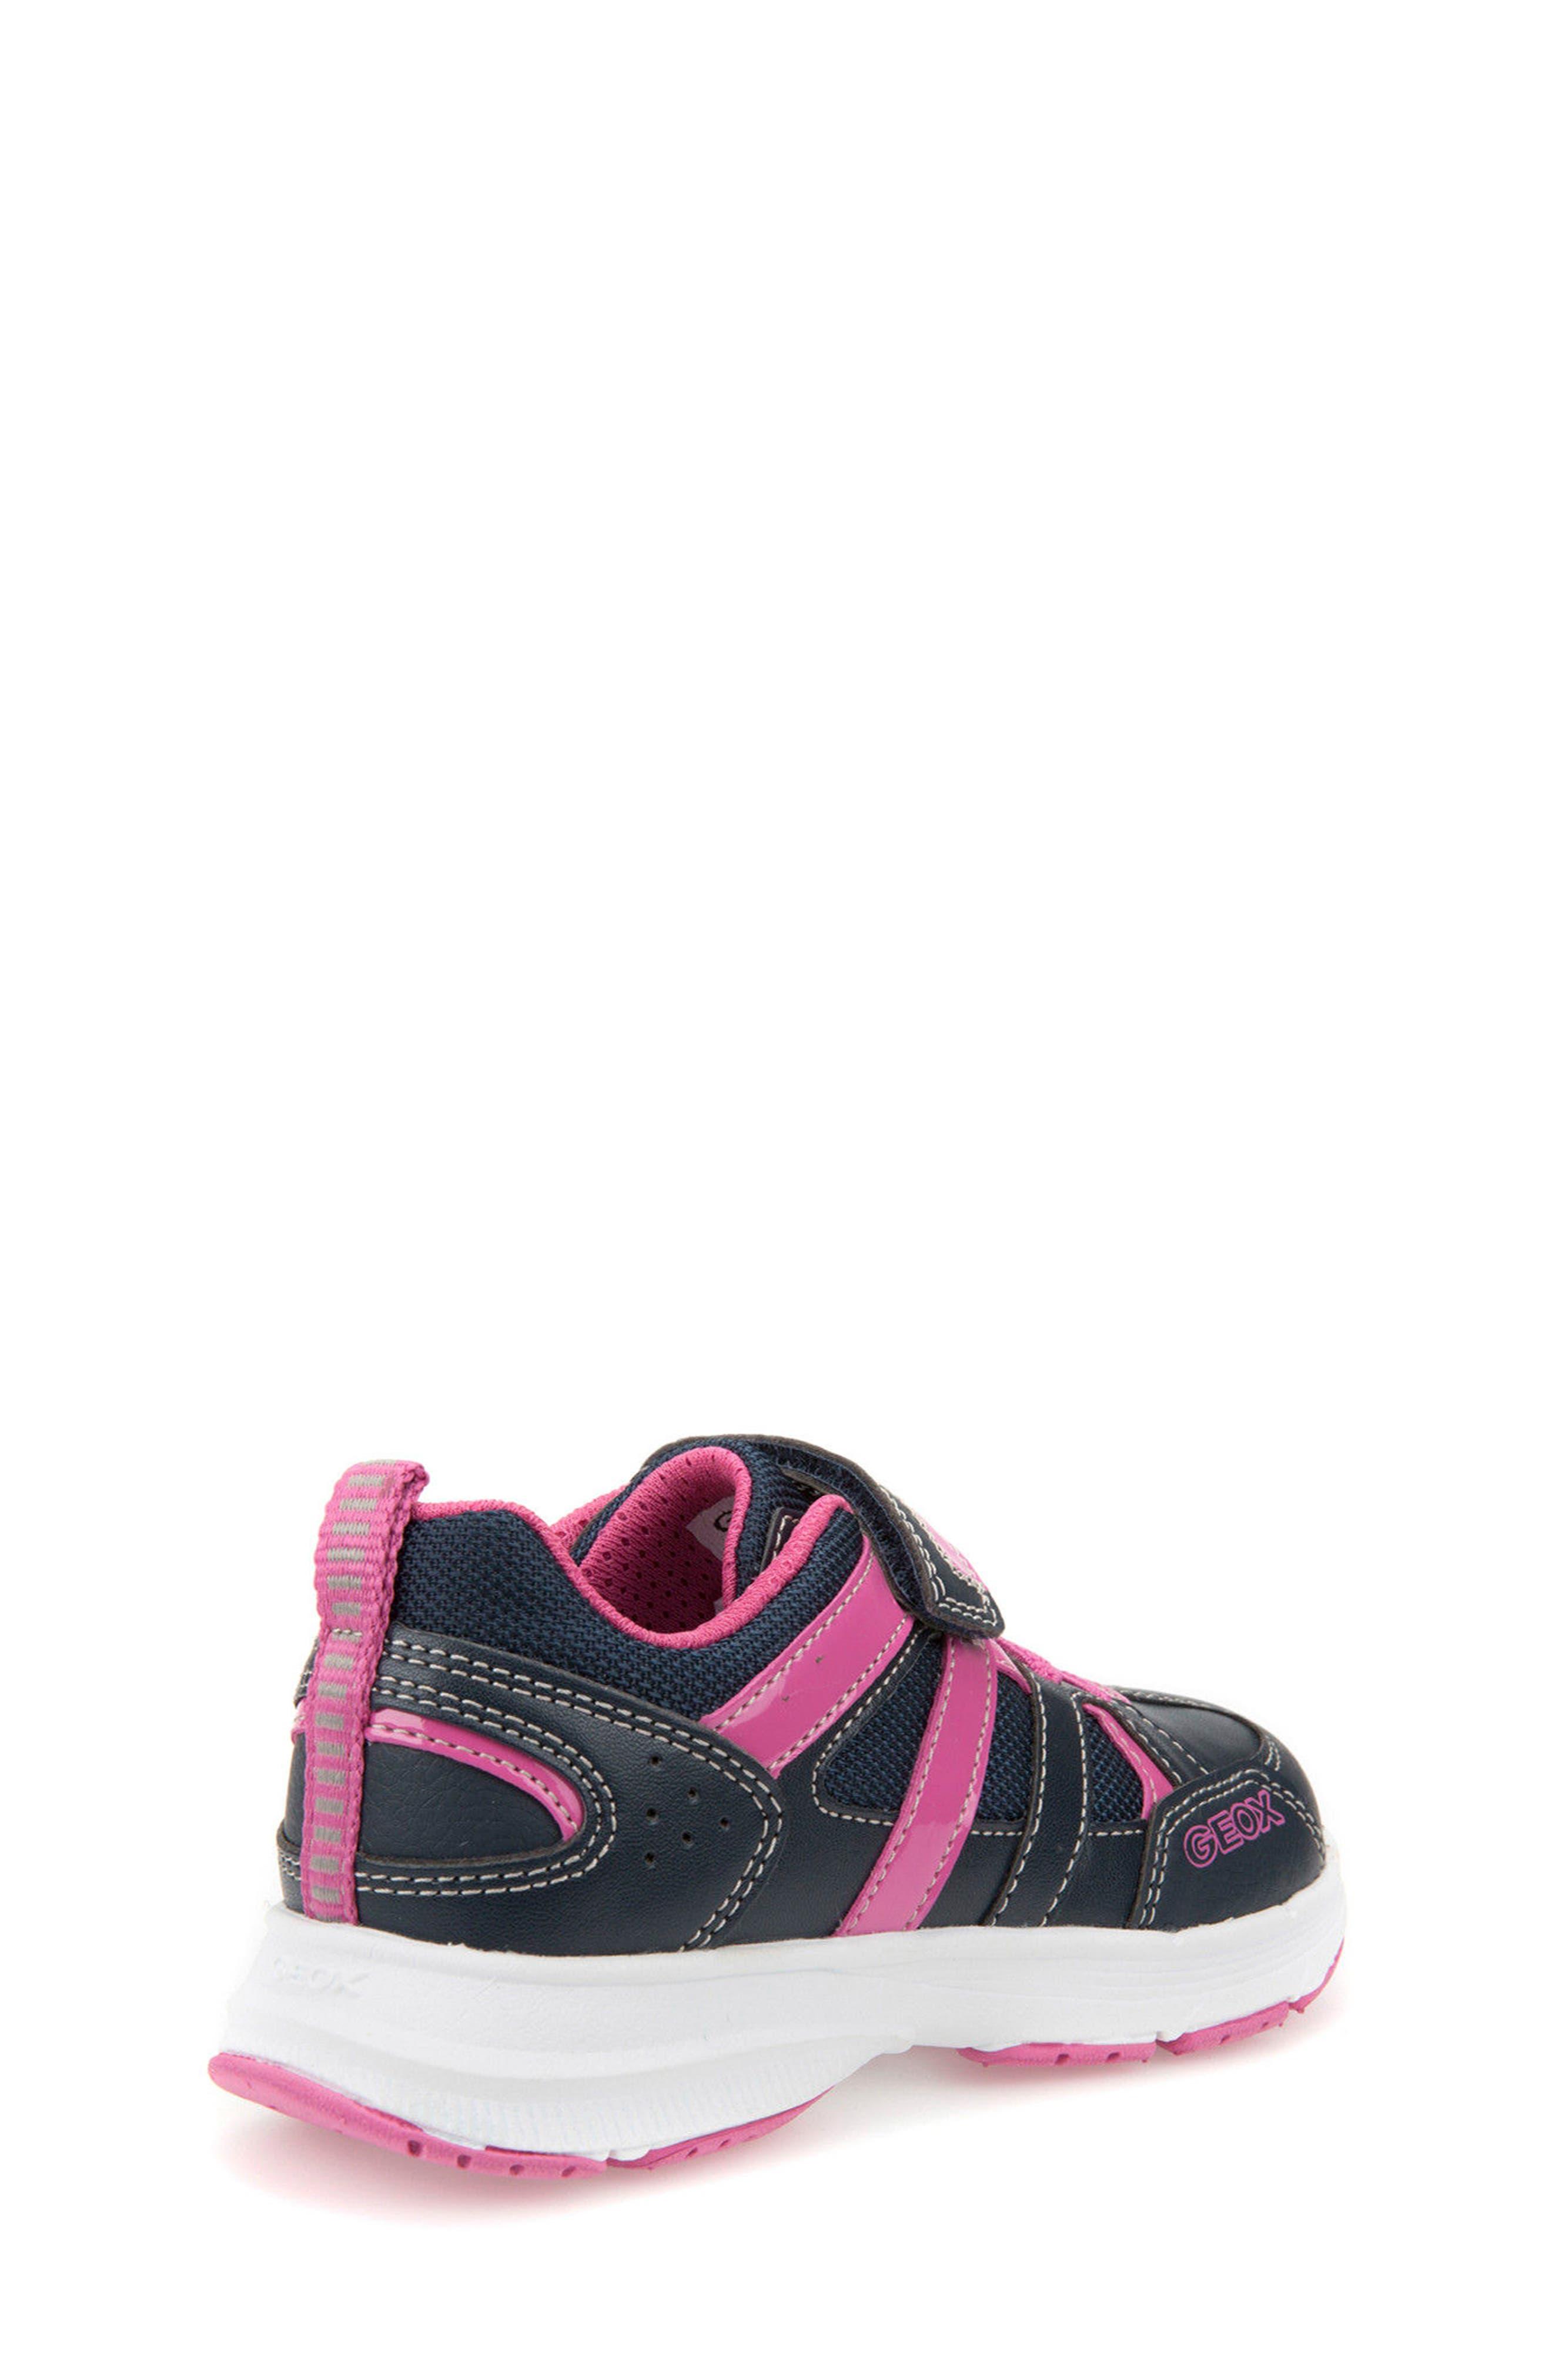 Top Fly Sneaker,                             Alternate thumbnail 5, color,